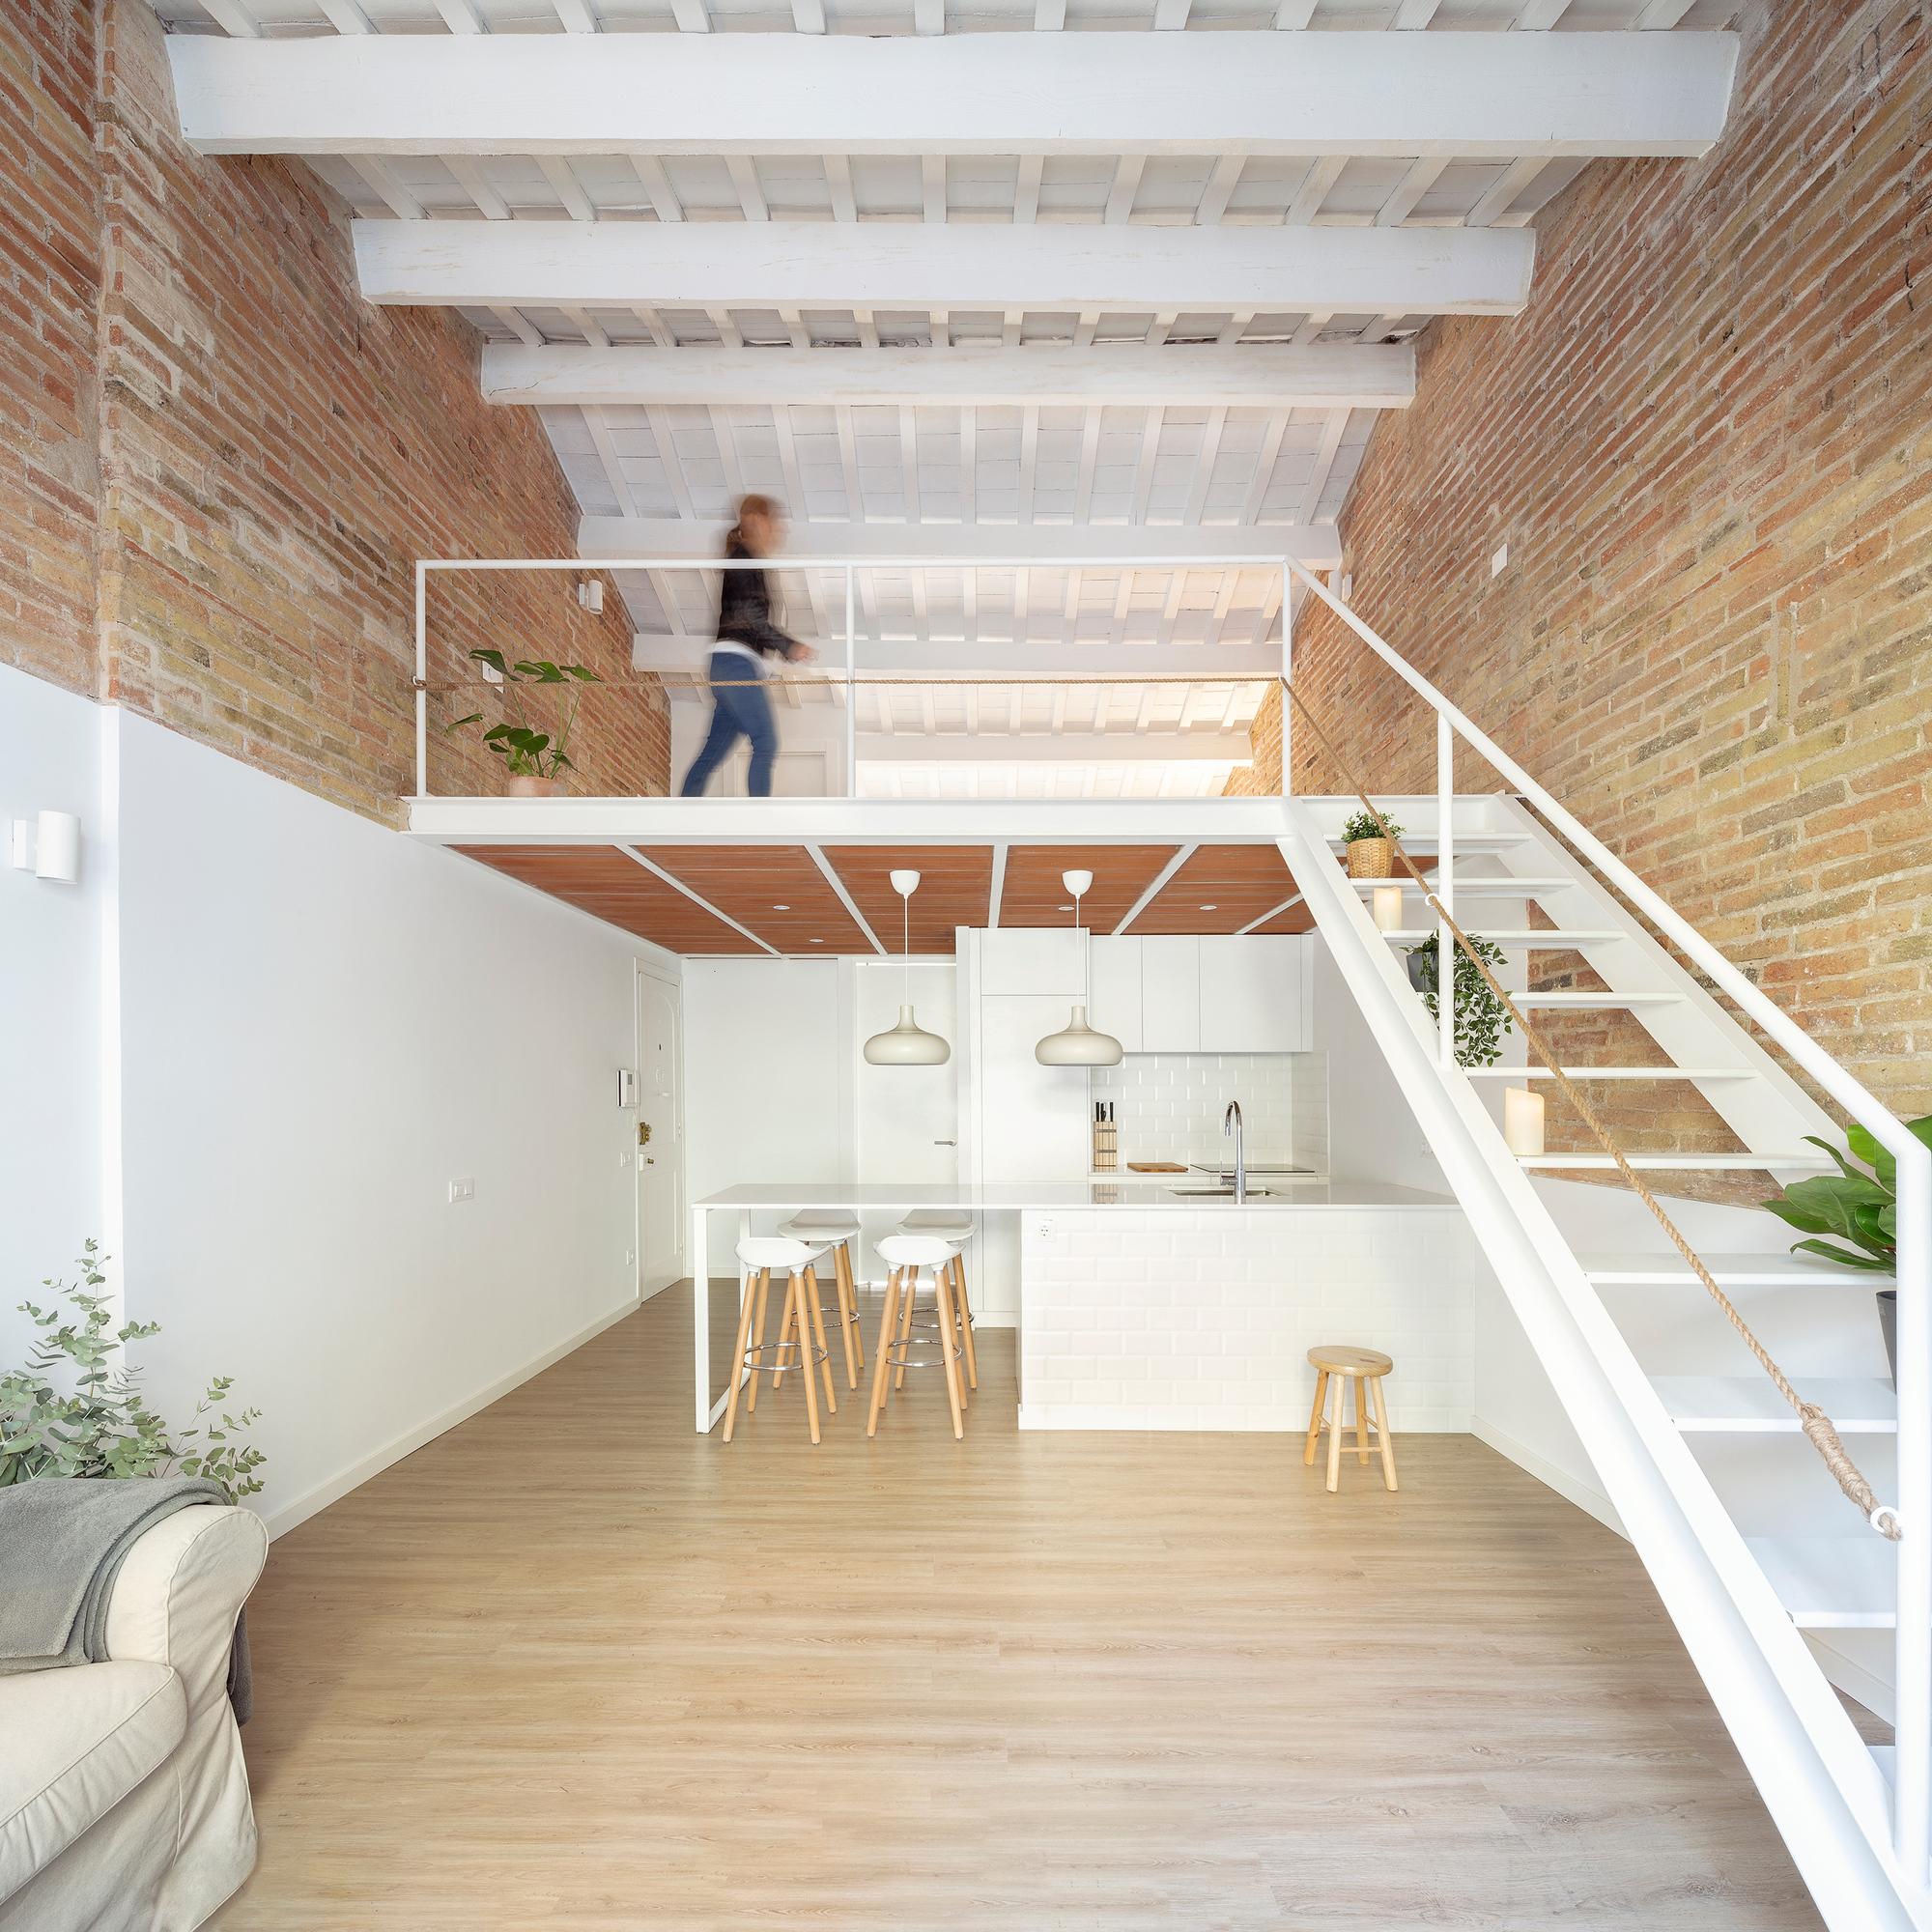 Mezzanine House Refurbishment Sergi Pons Architects Archdaily